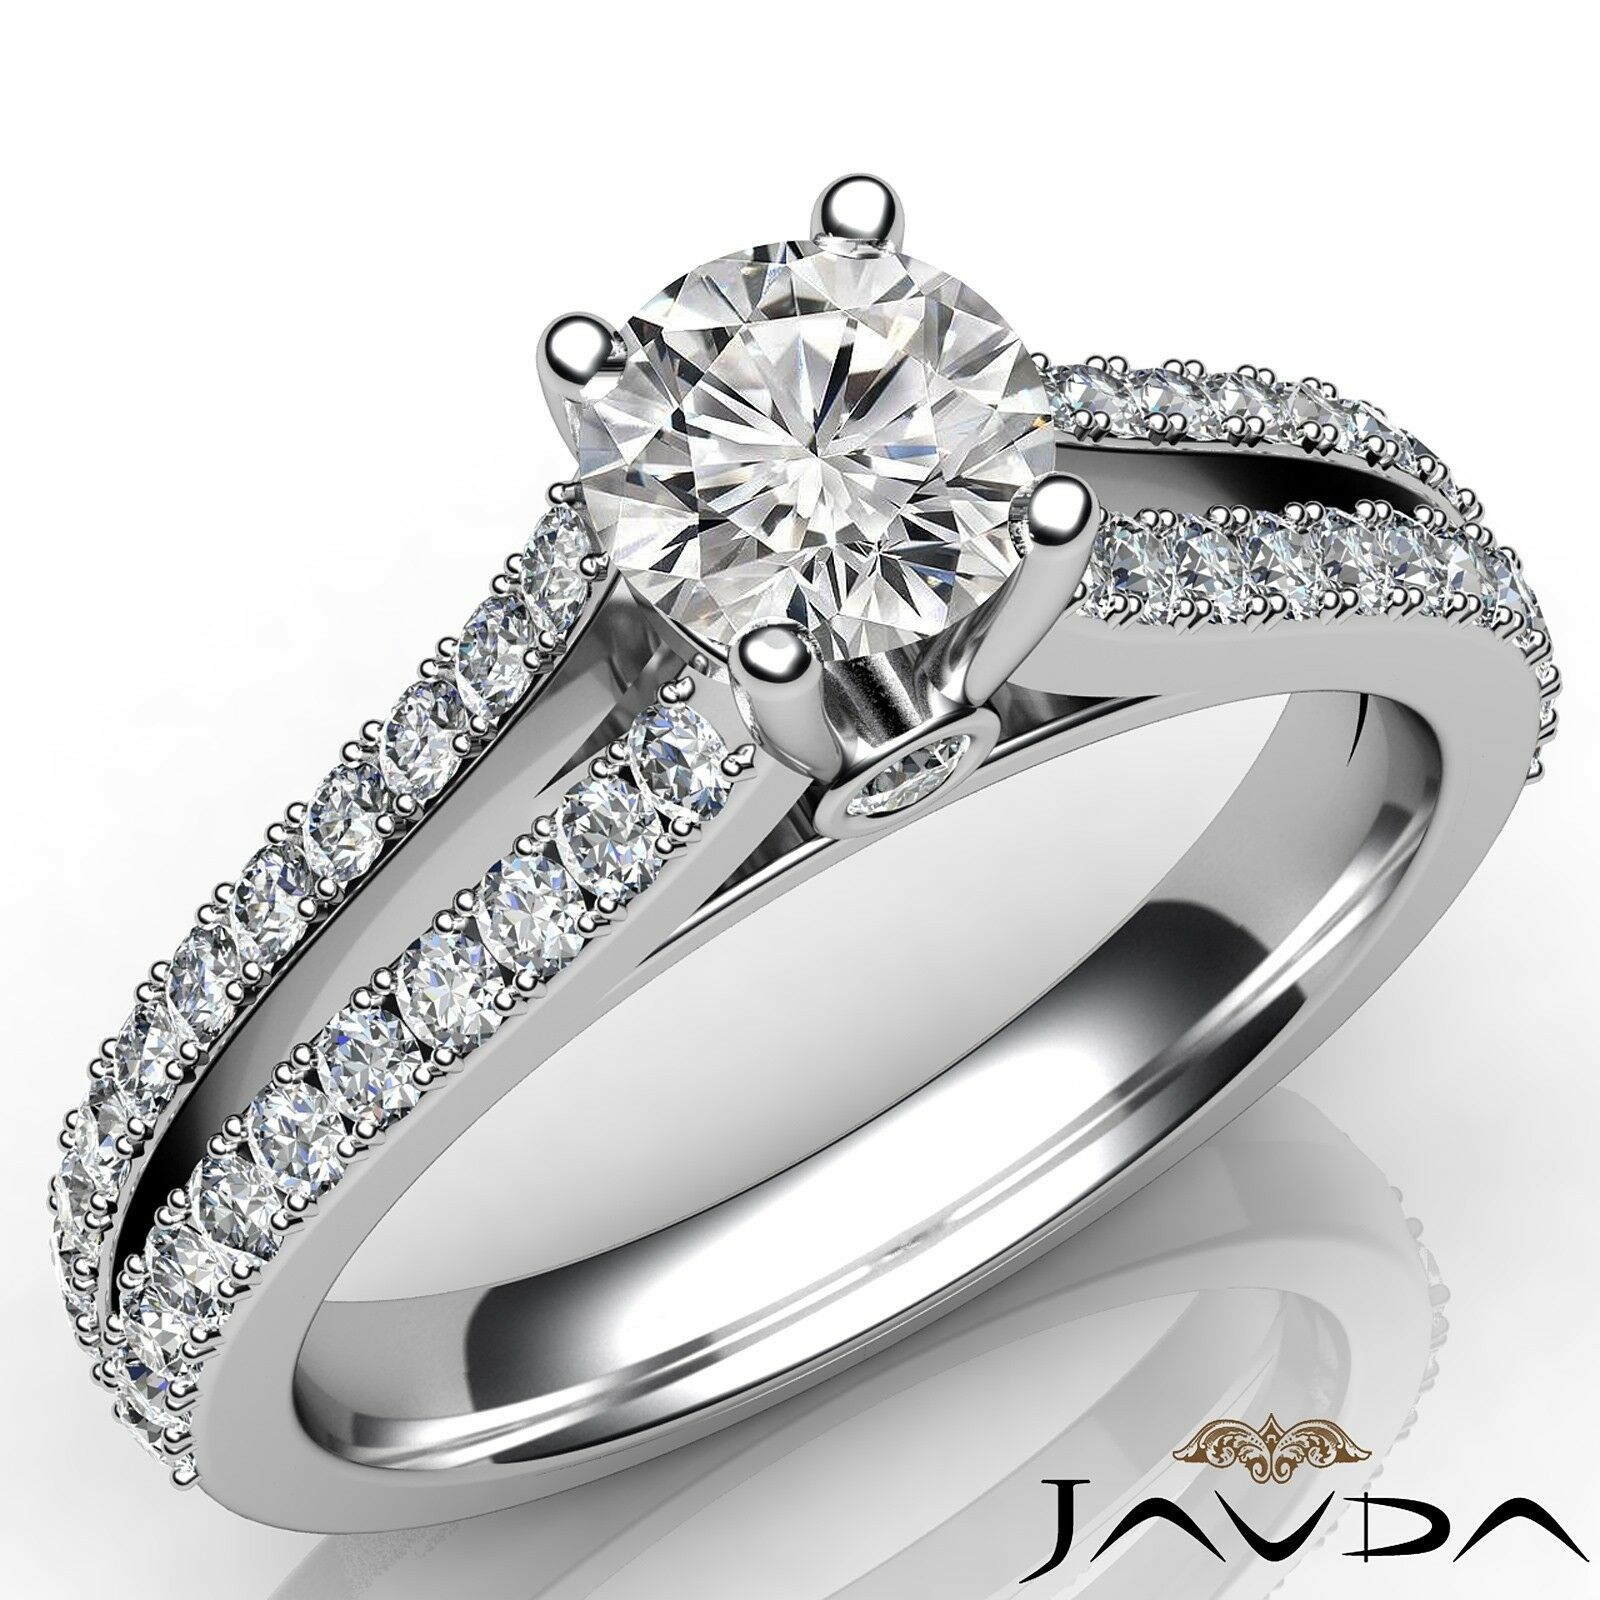 1.15ctw Double Prong Round Diamond Engagement Ring GIA G-VS2 White Gold Women